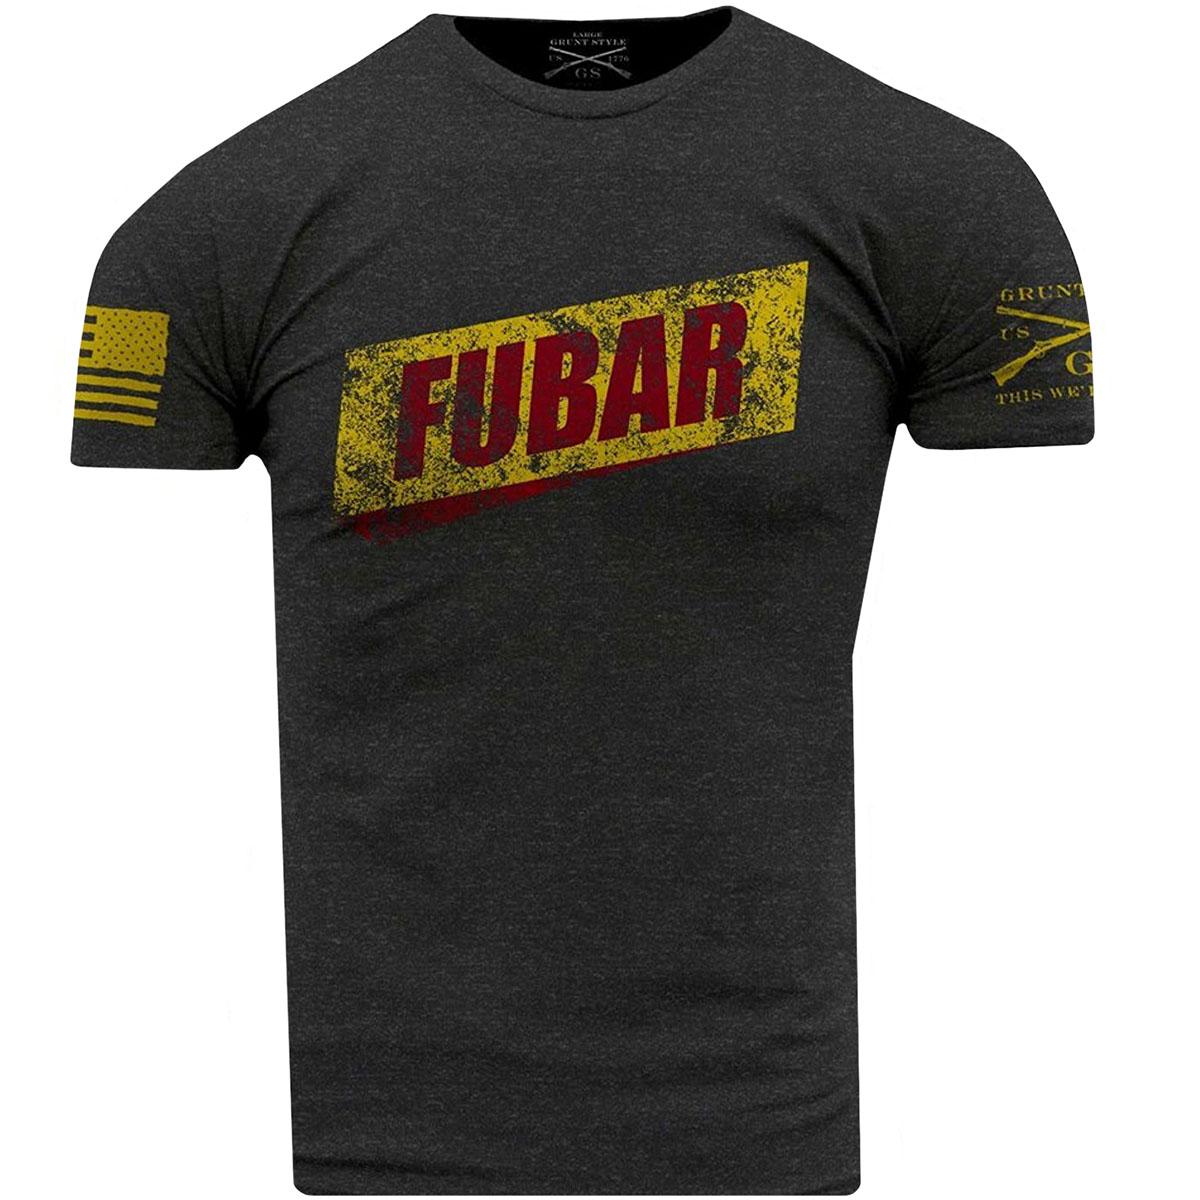 665d111c Details about Grunt Style FUBAR T-Shirt - Heather Gray